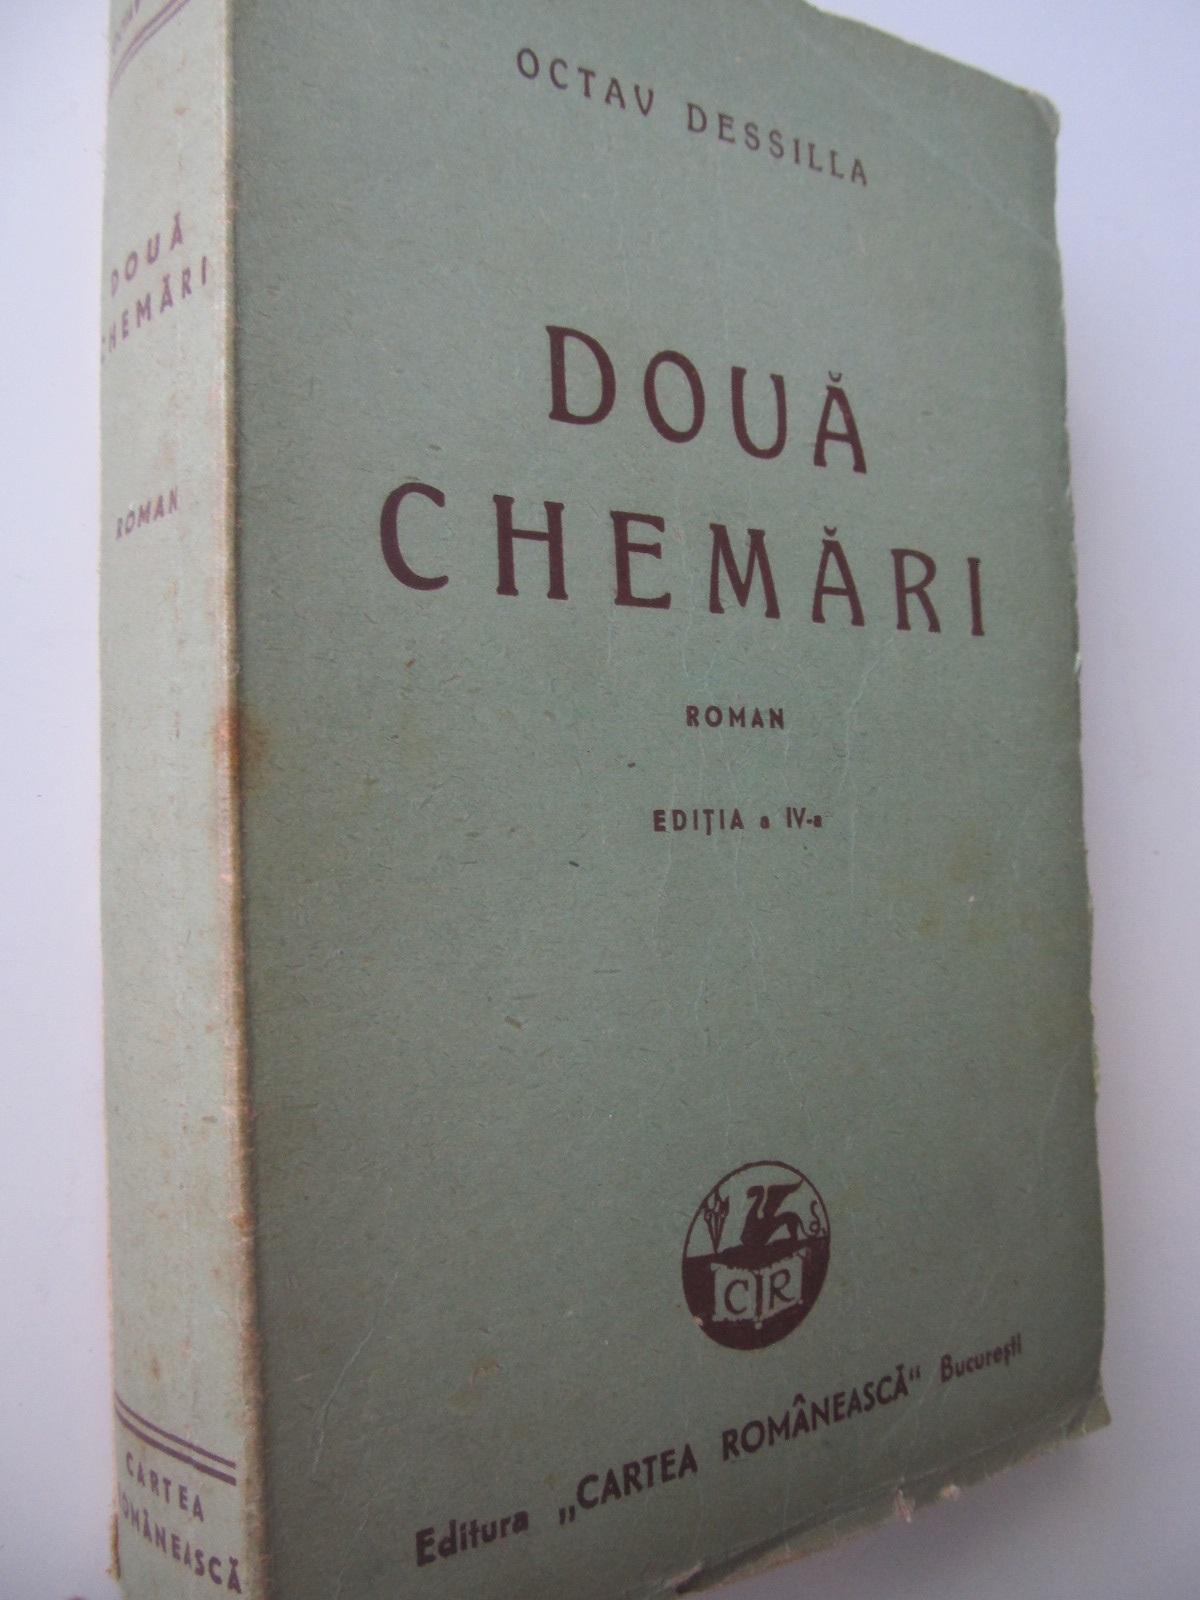 Doua chemari - Octav Dessilla | Detalii carte